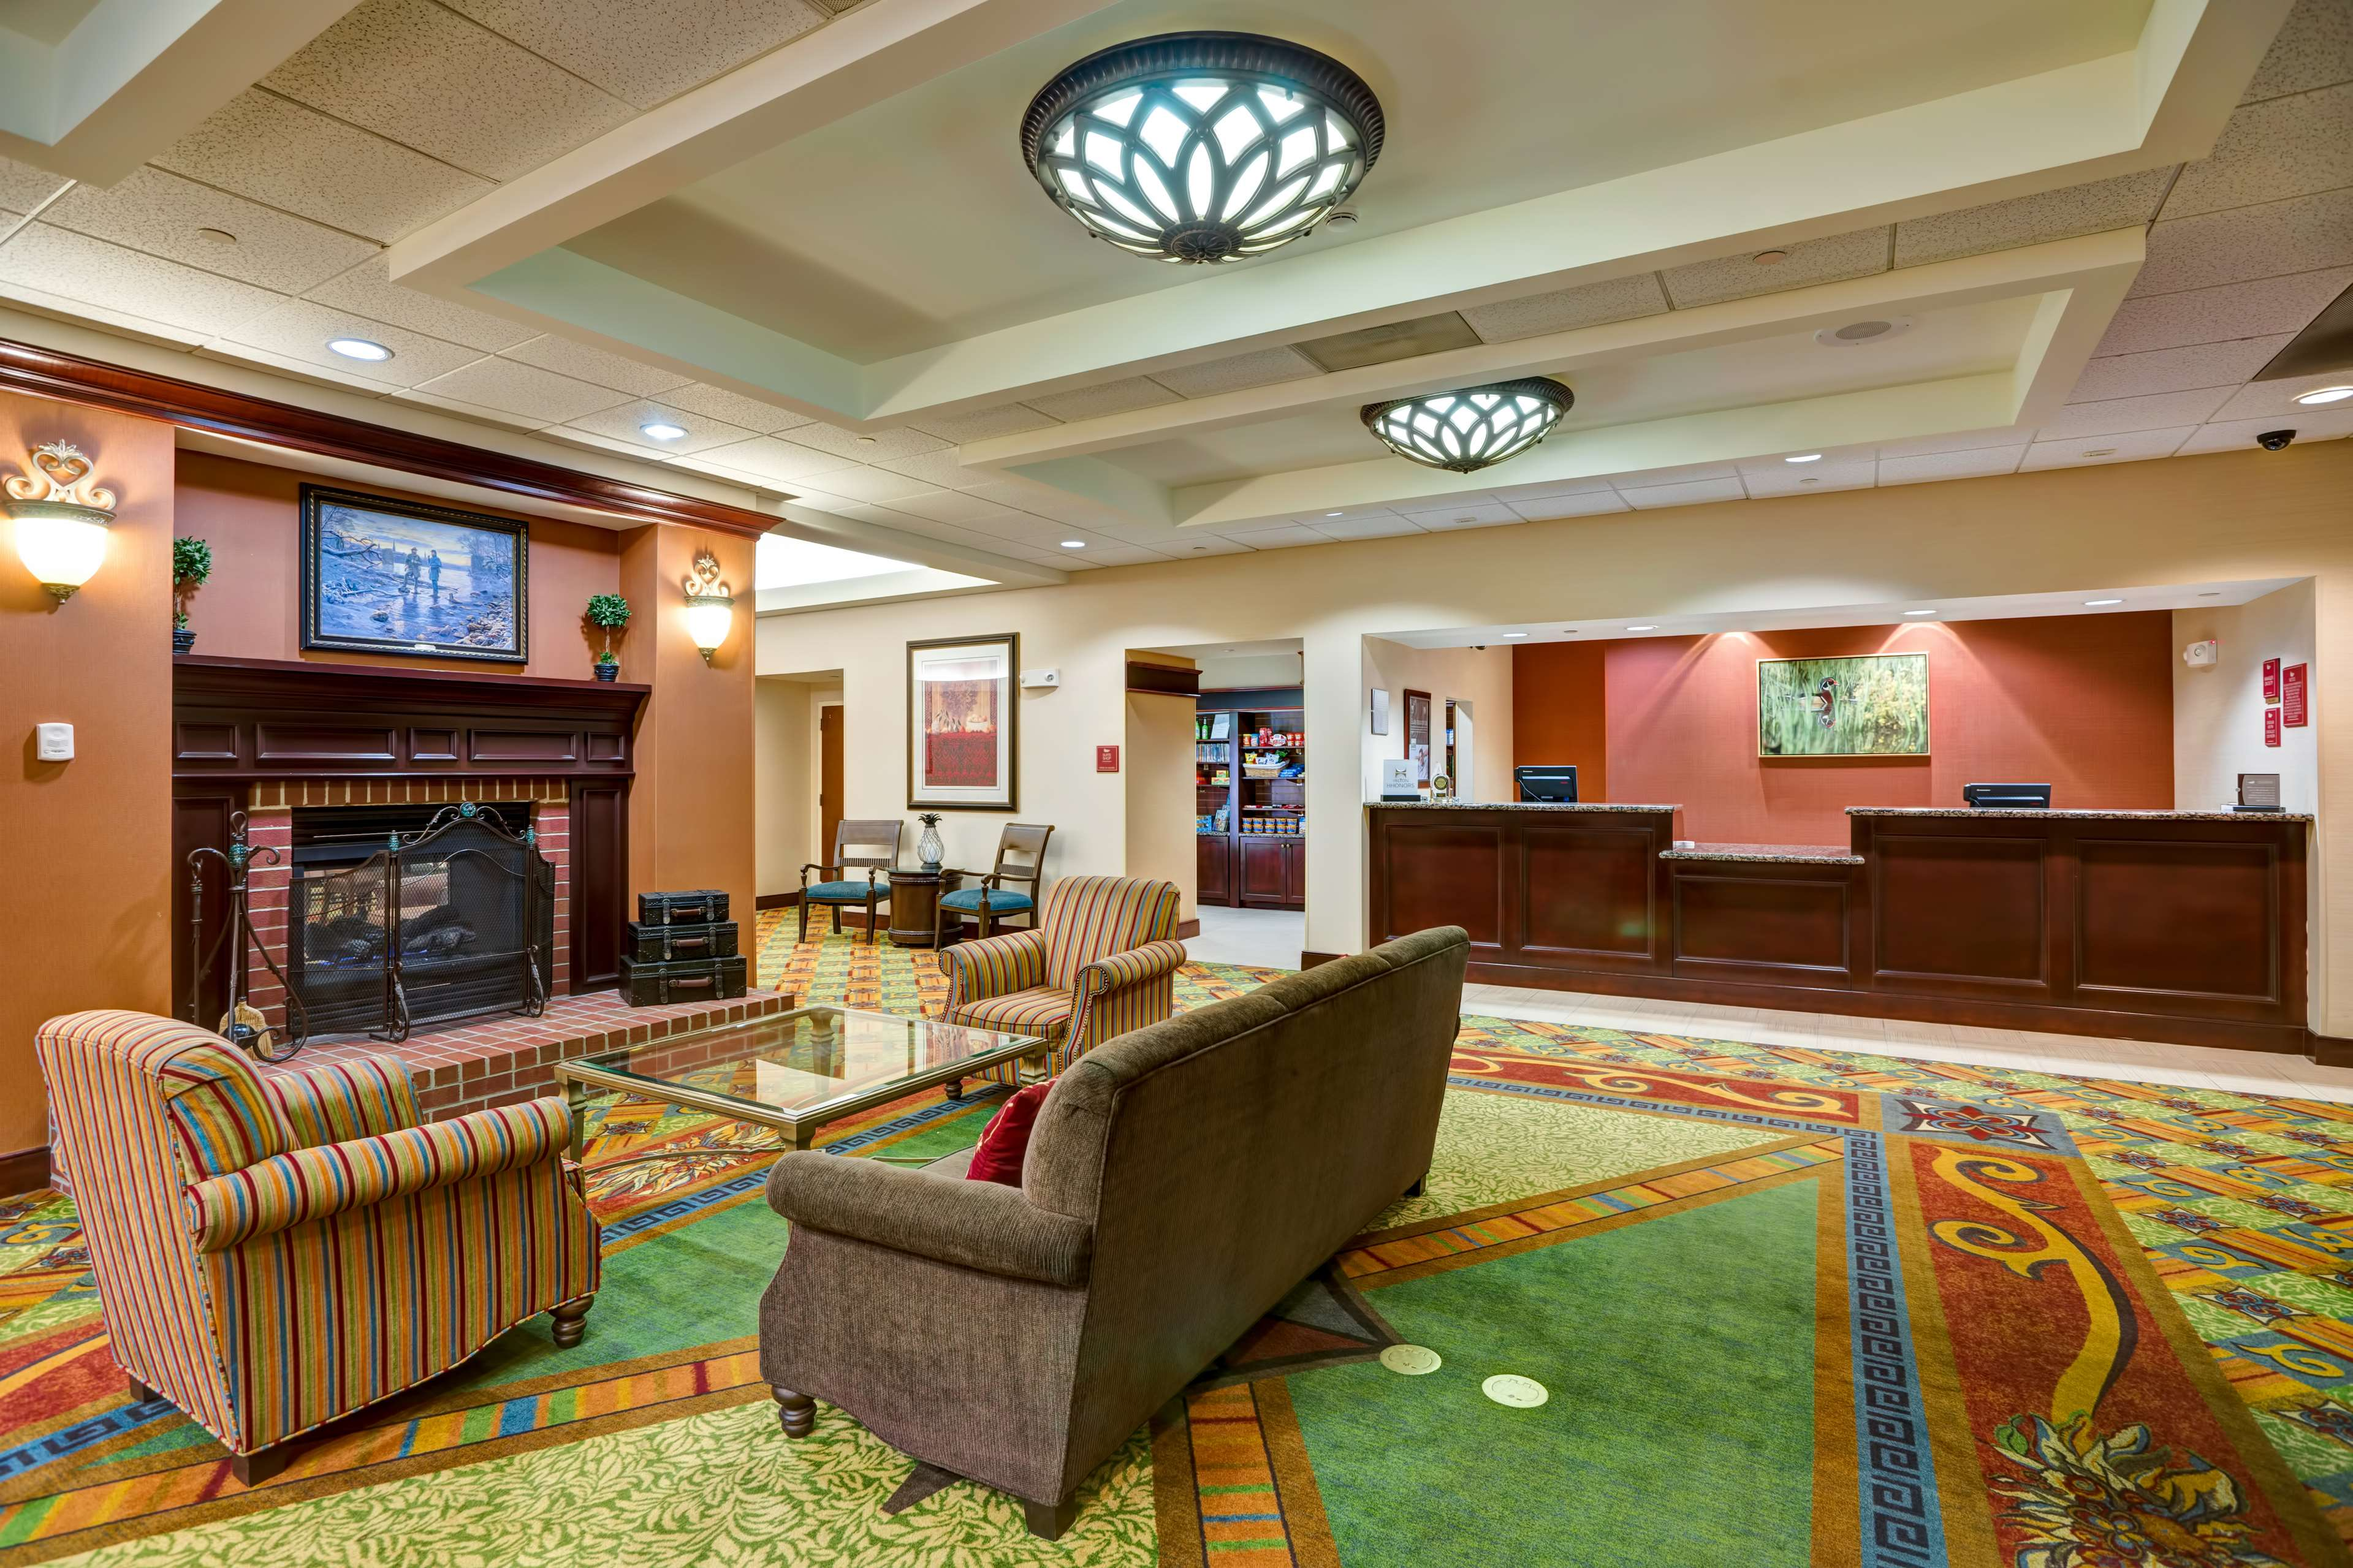 Homewood Suites by Hilton Fredericksburg image 1